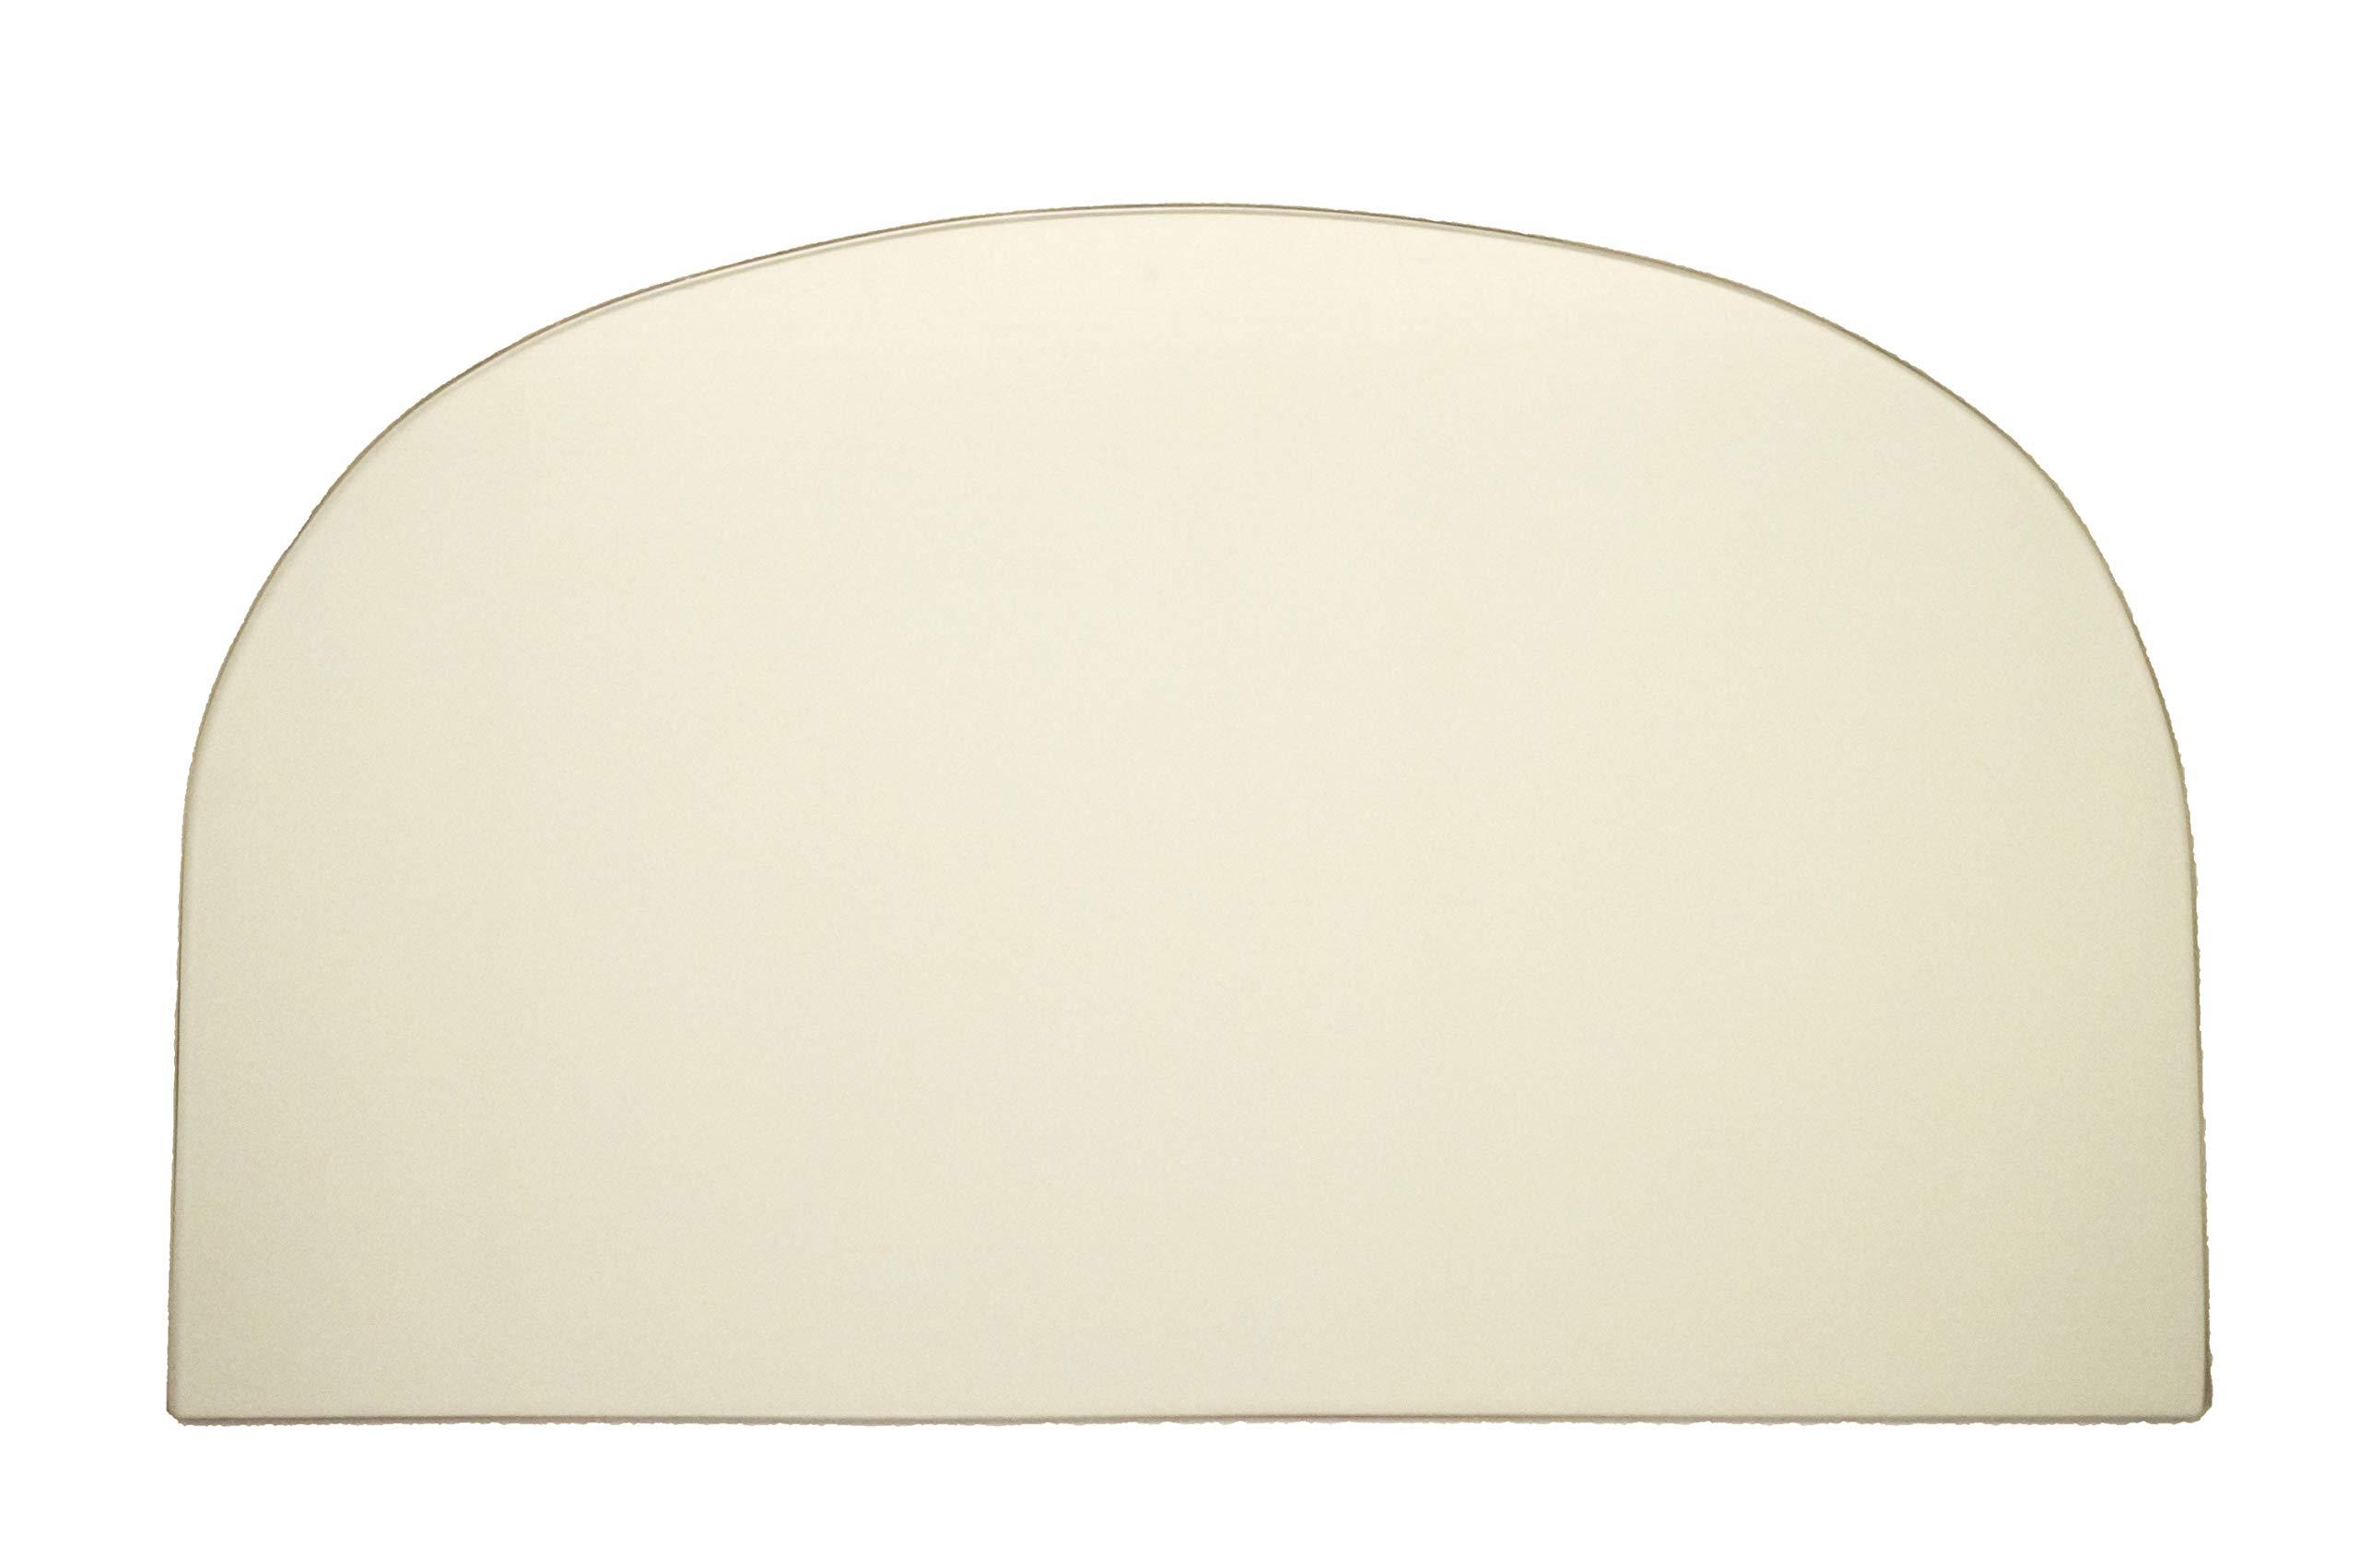 Jotul F400 Castine Wood Stove Glass Kit (1/8'' Thick) by Jotul